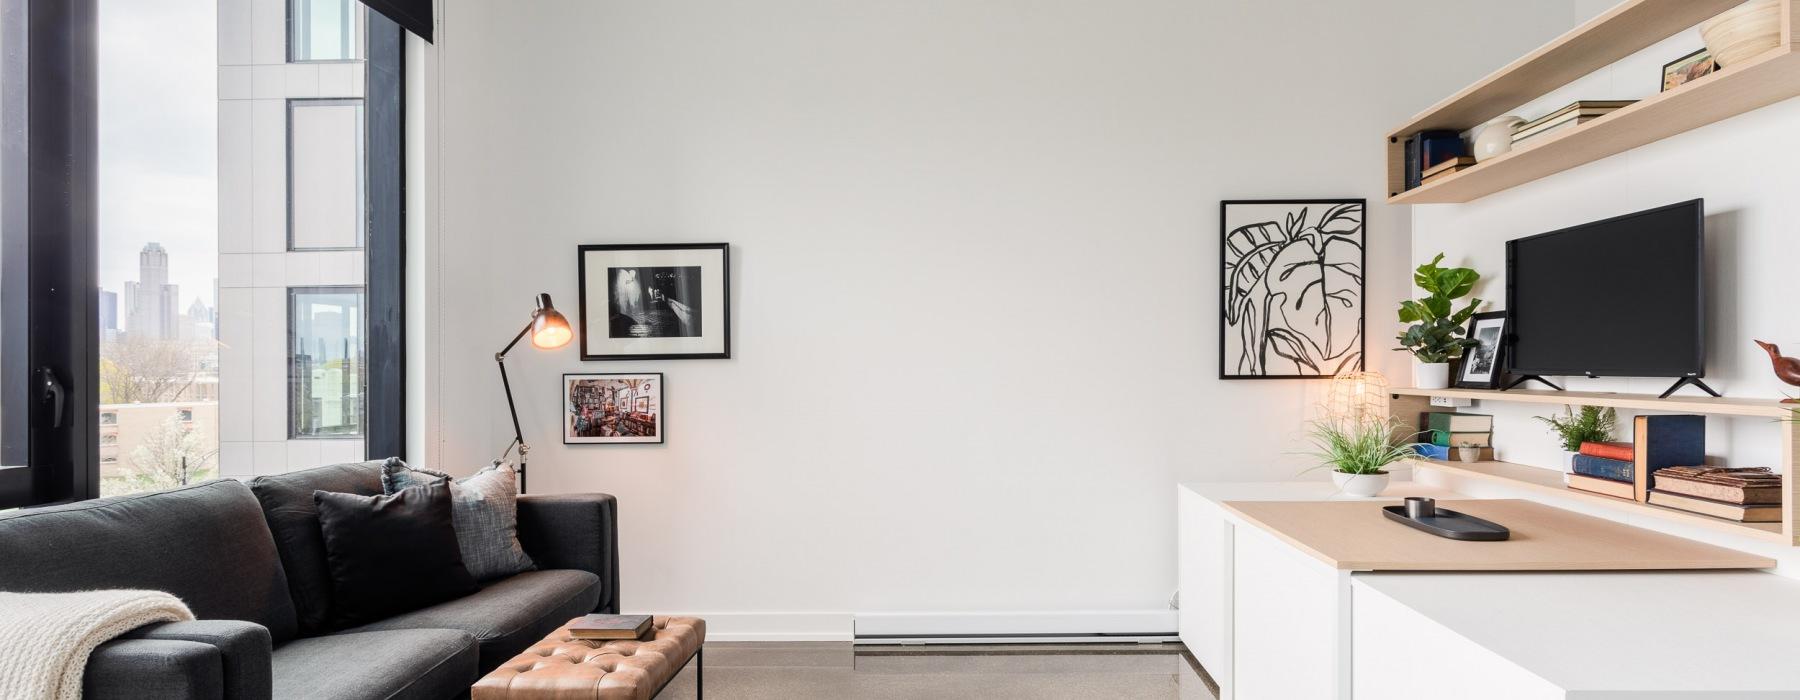 One Bedroom Living in a Studio Space